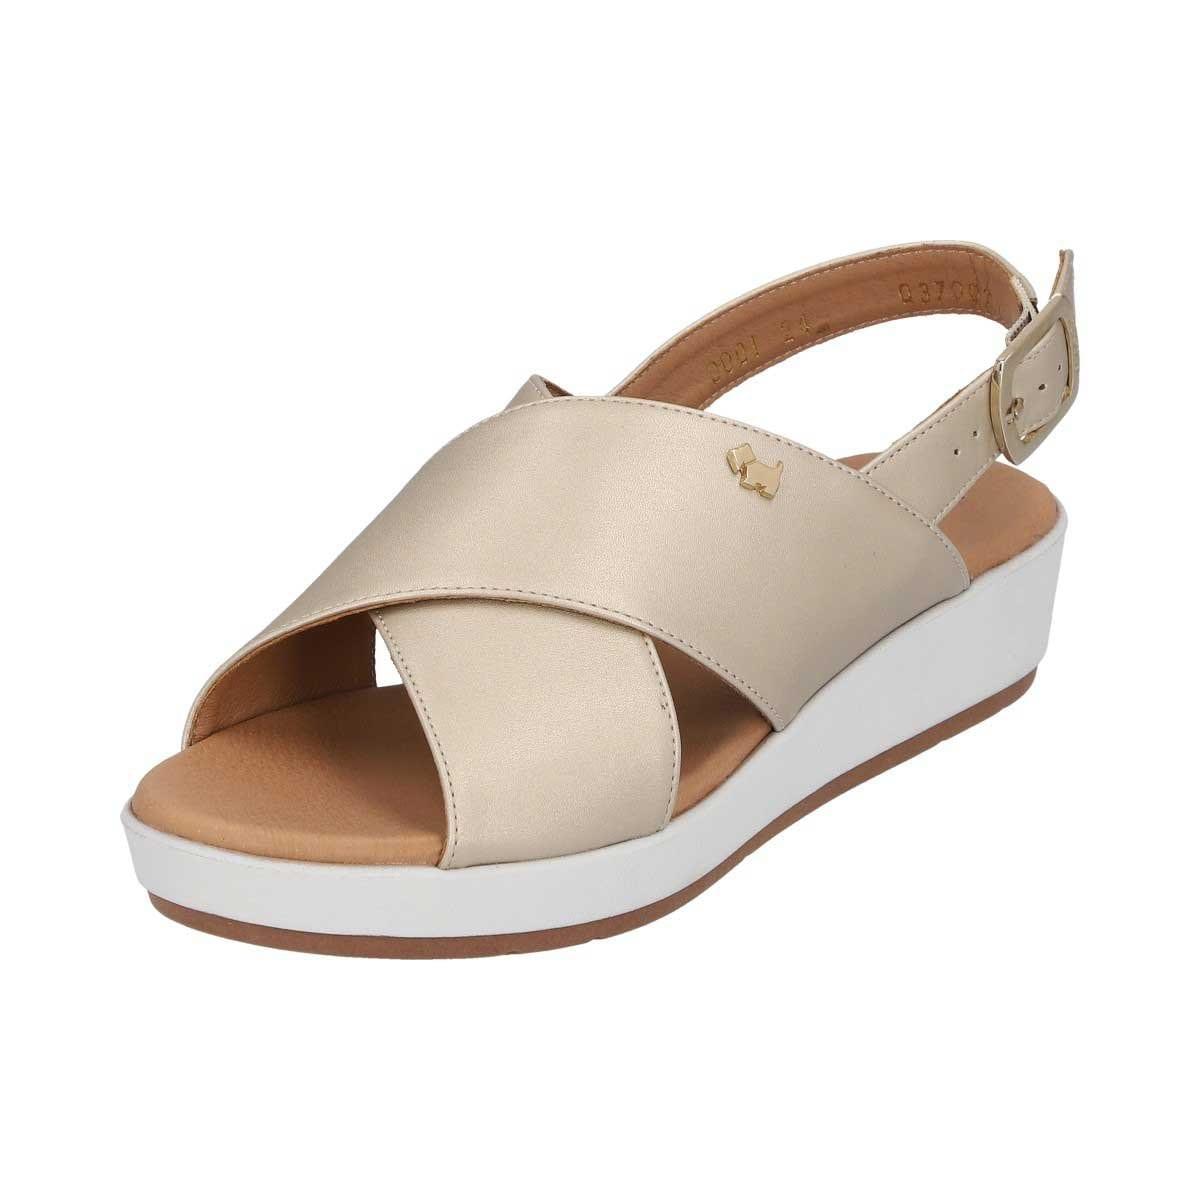 Sandalia de Tiras Cruzadas Ferrioni